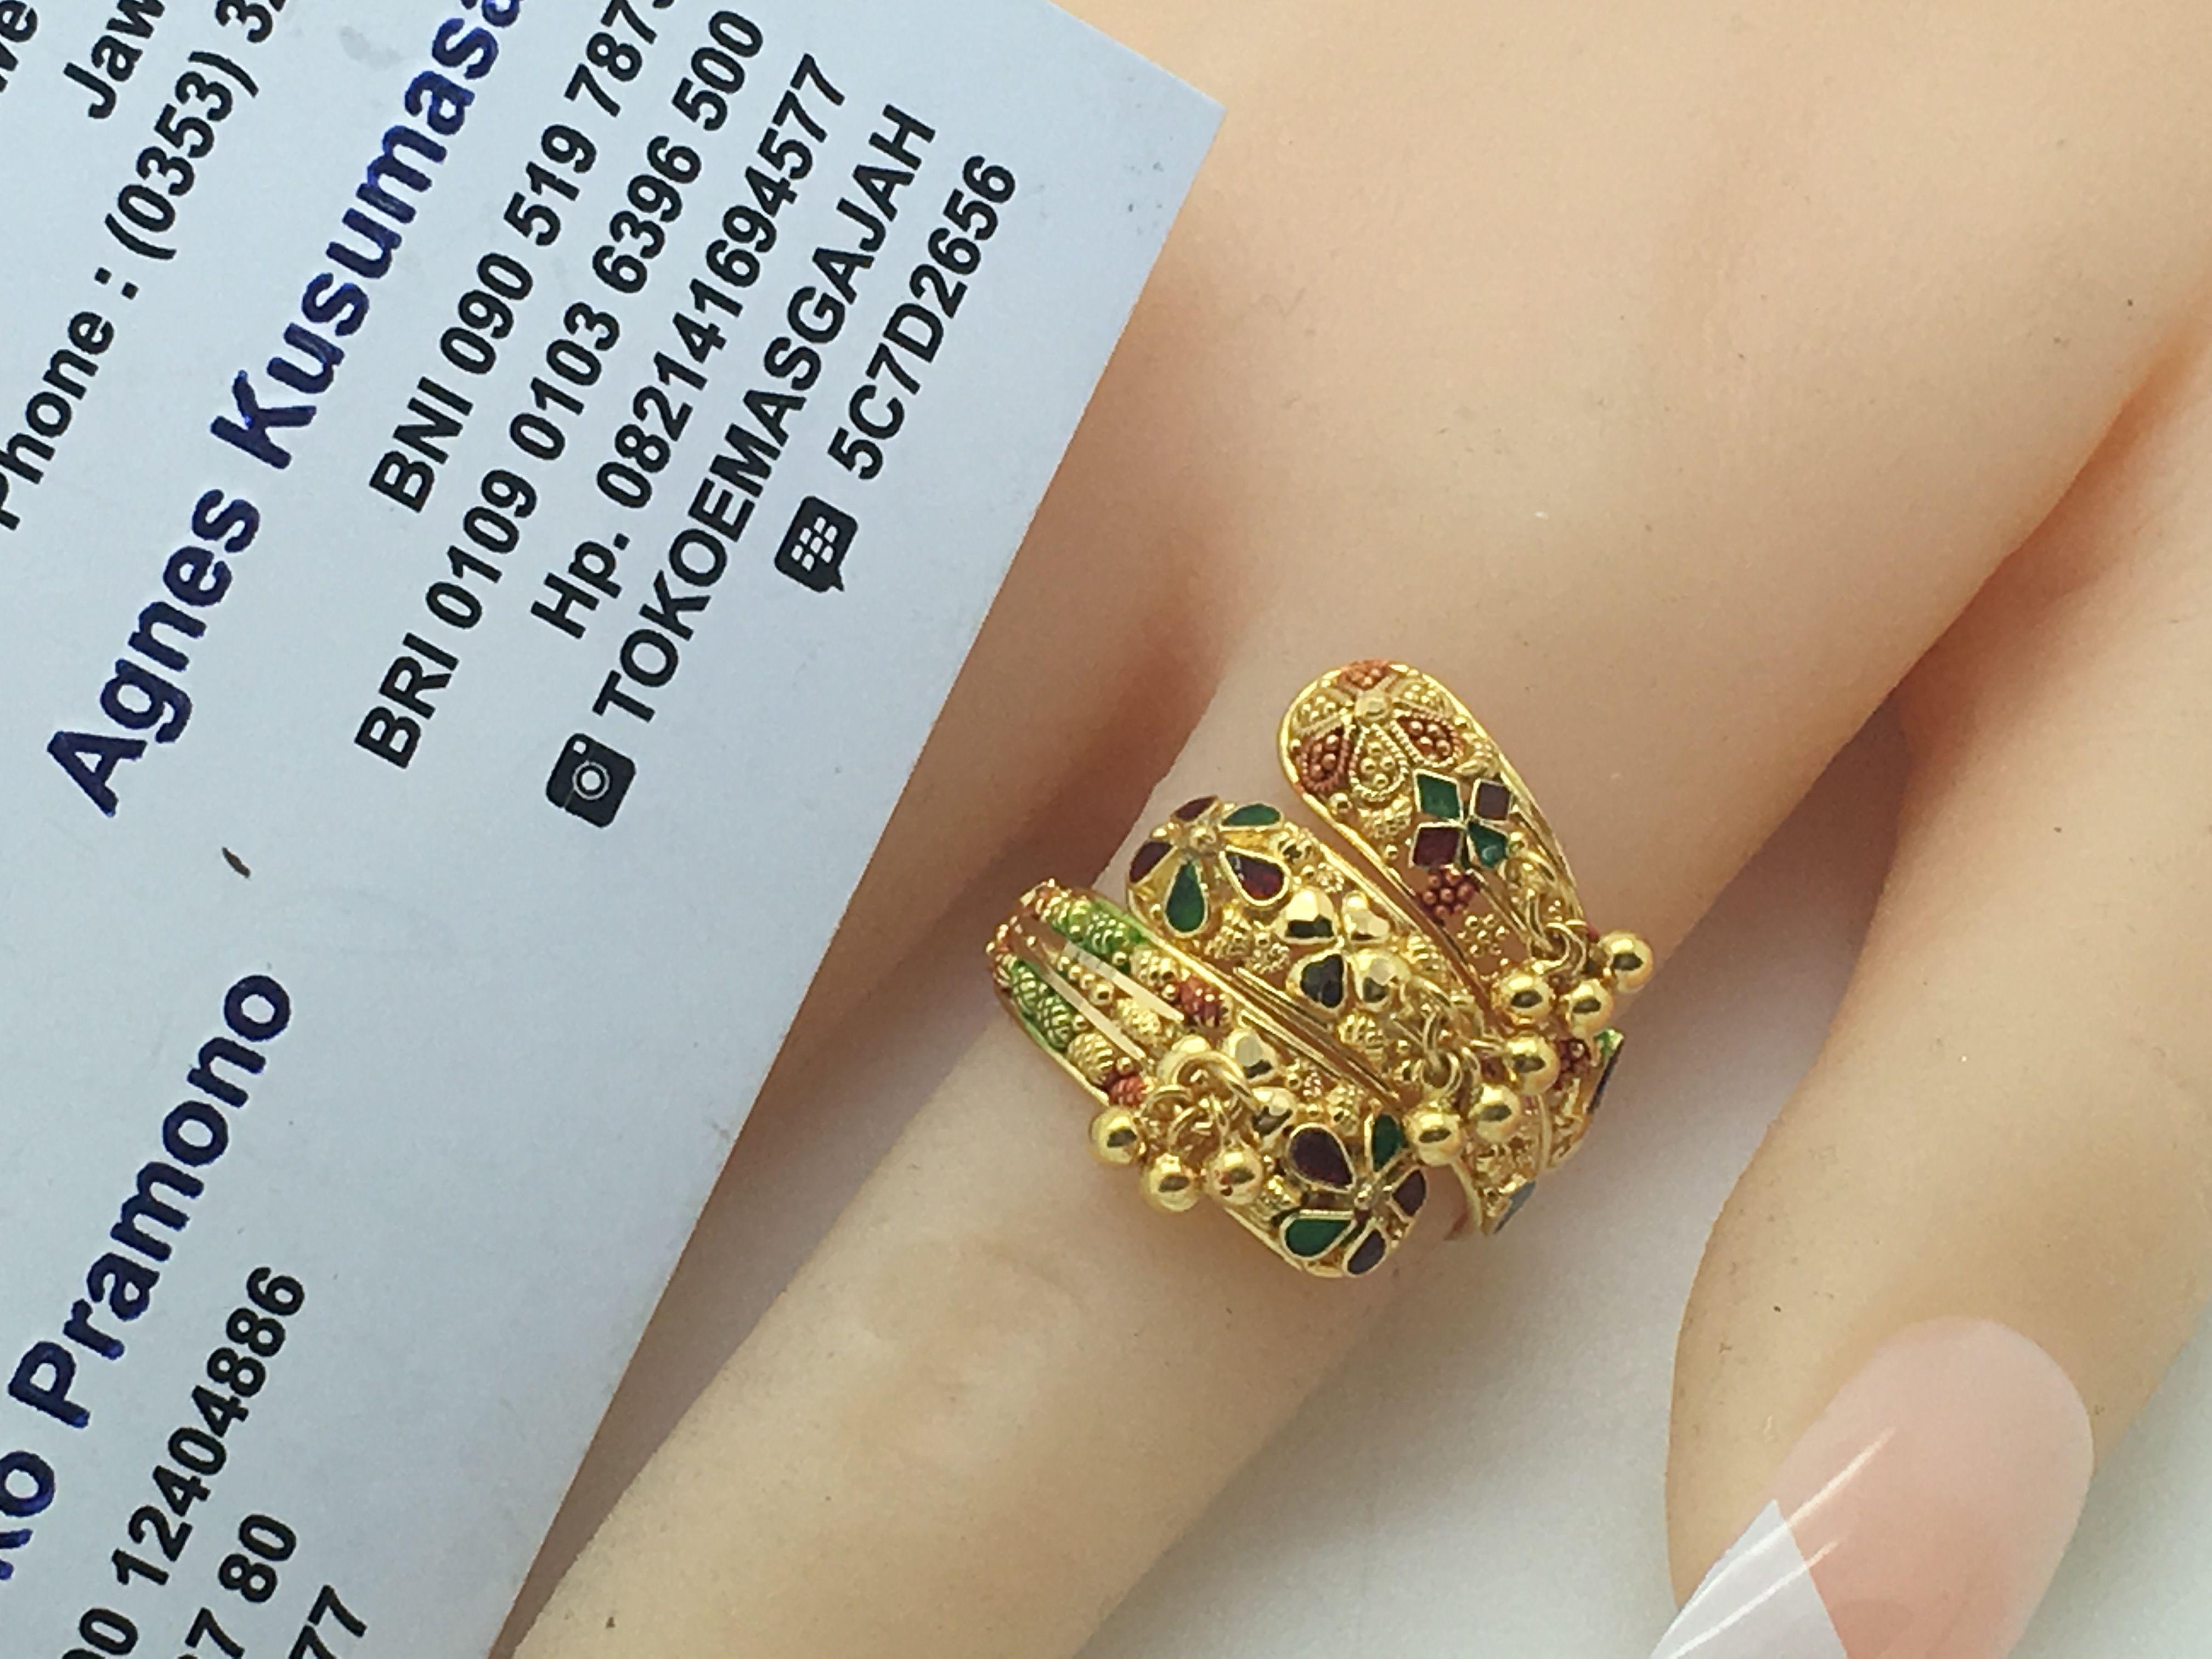 22k 91 6 Gold Dubai India Swirl Ring Adujule Size